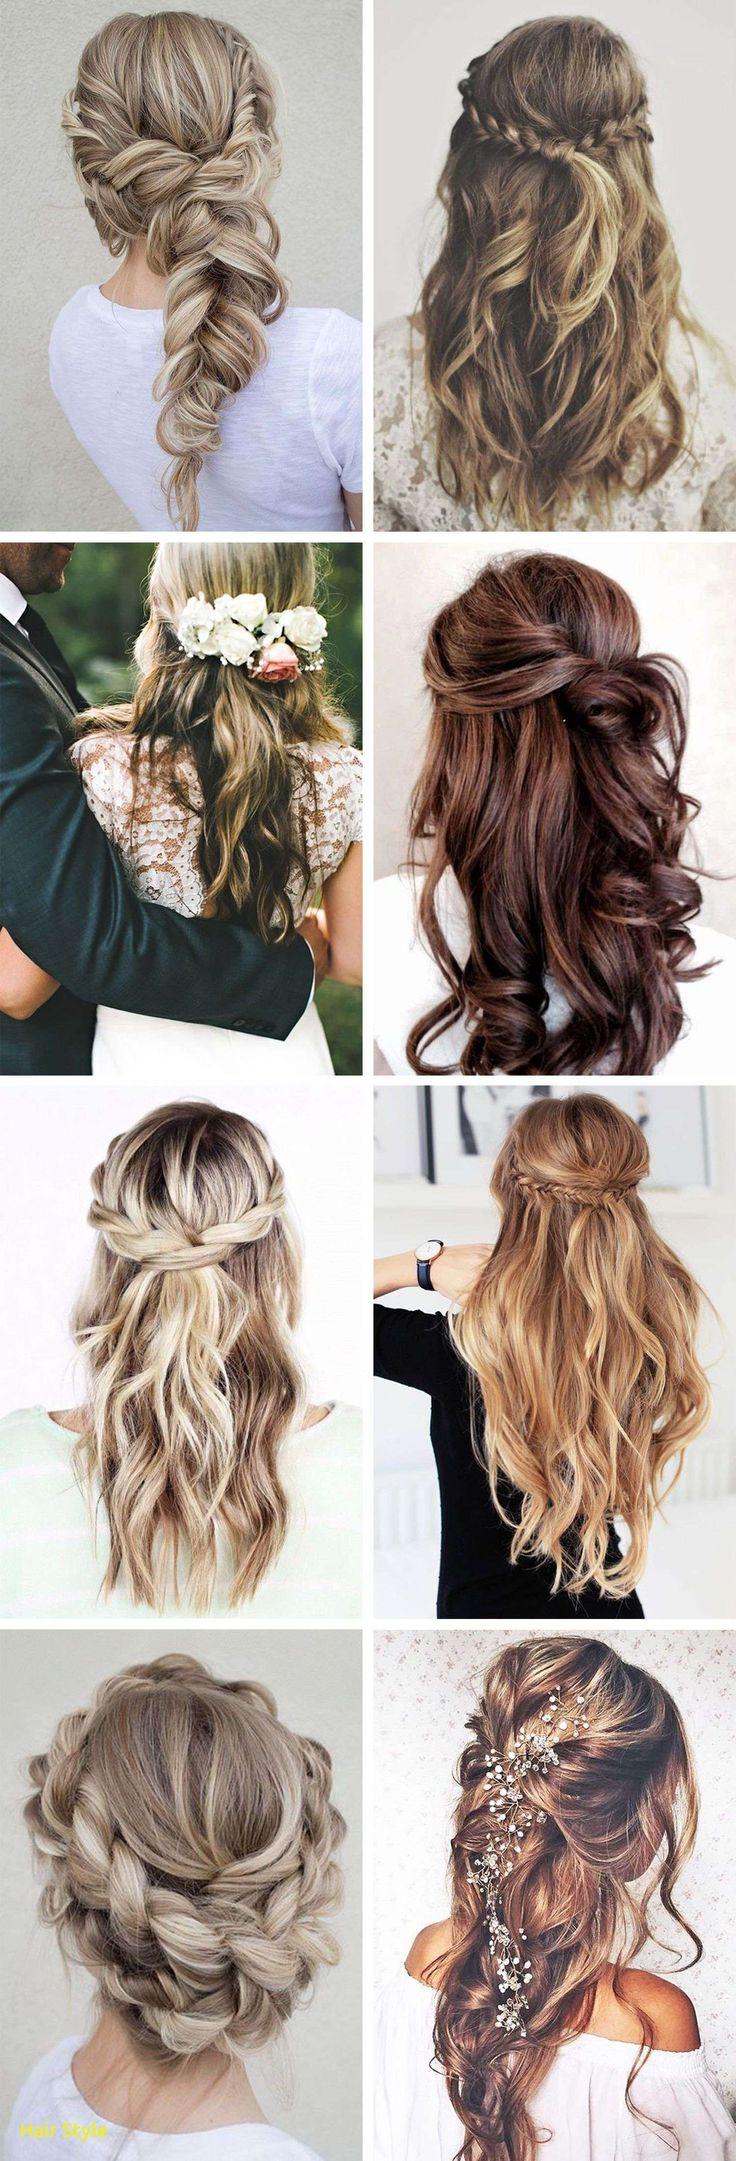 Unique wedding hair braids and curls